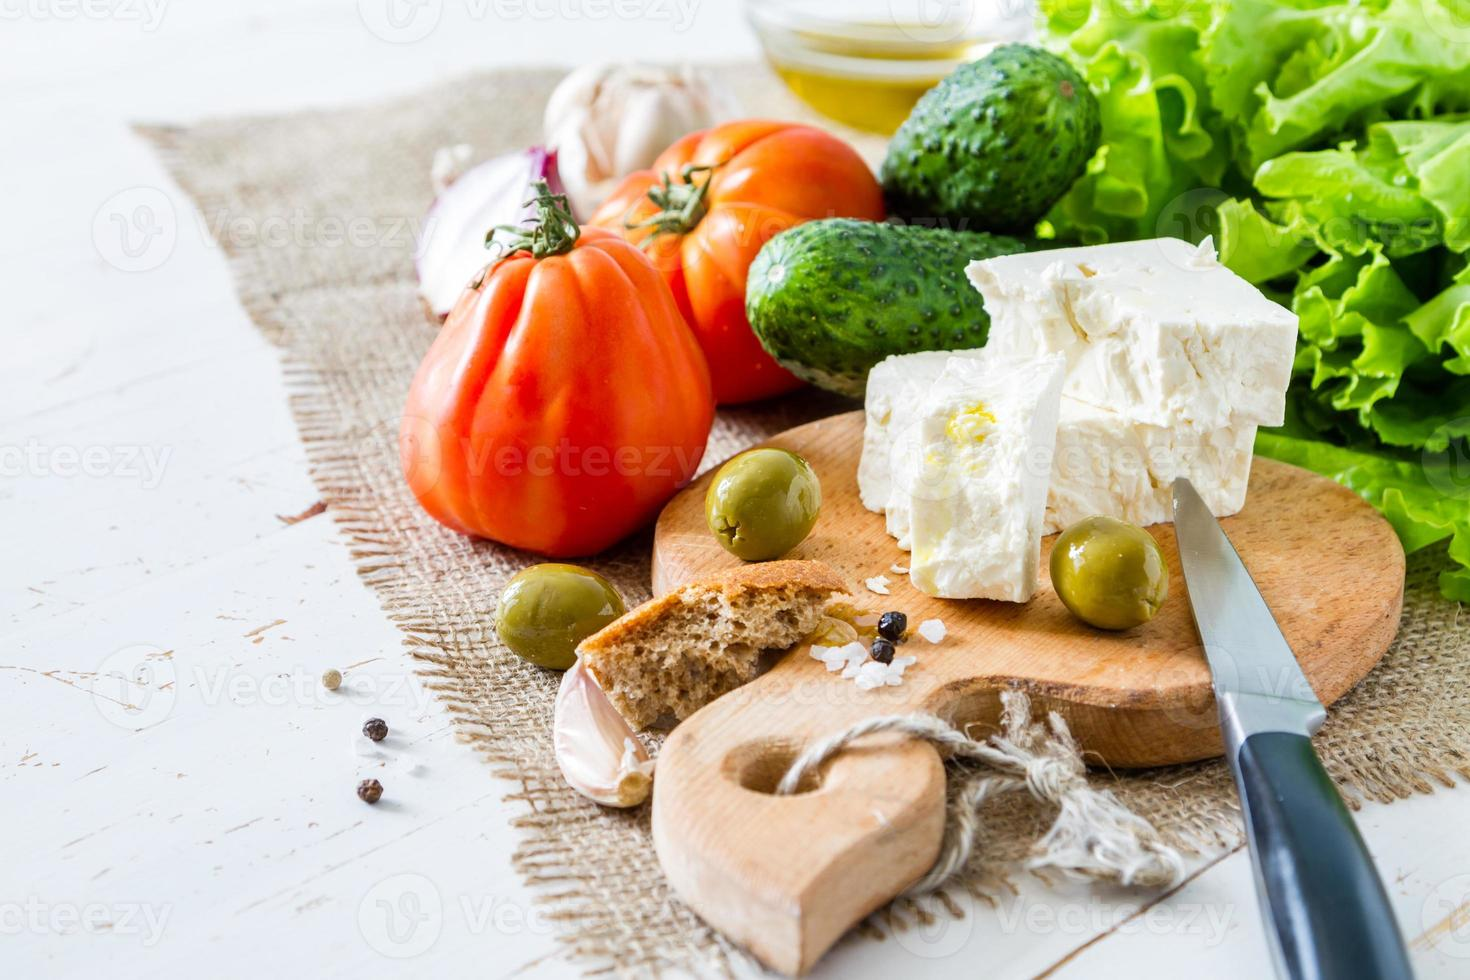 Salad ingredients - tomato, lettuce, cucumber, feta, onion, olive, garlic photo